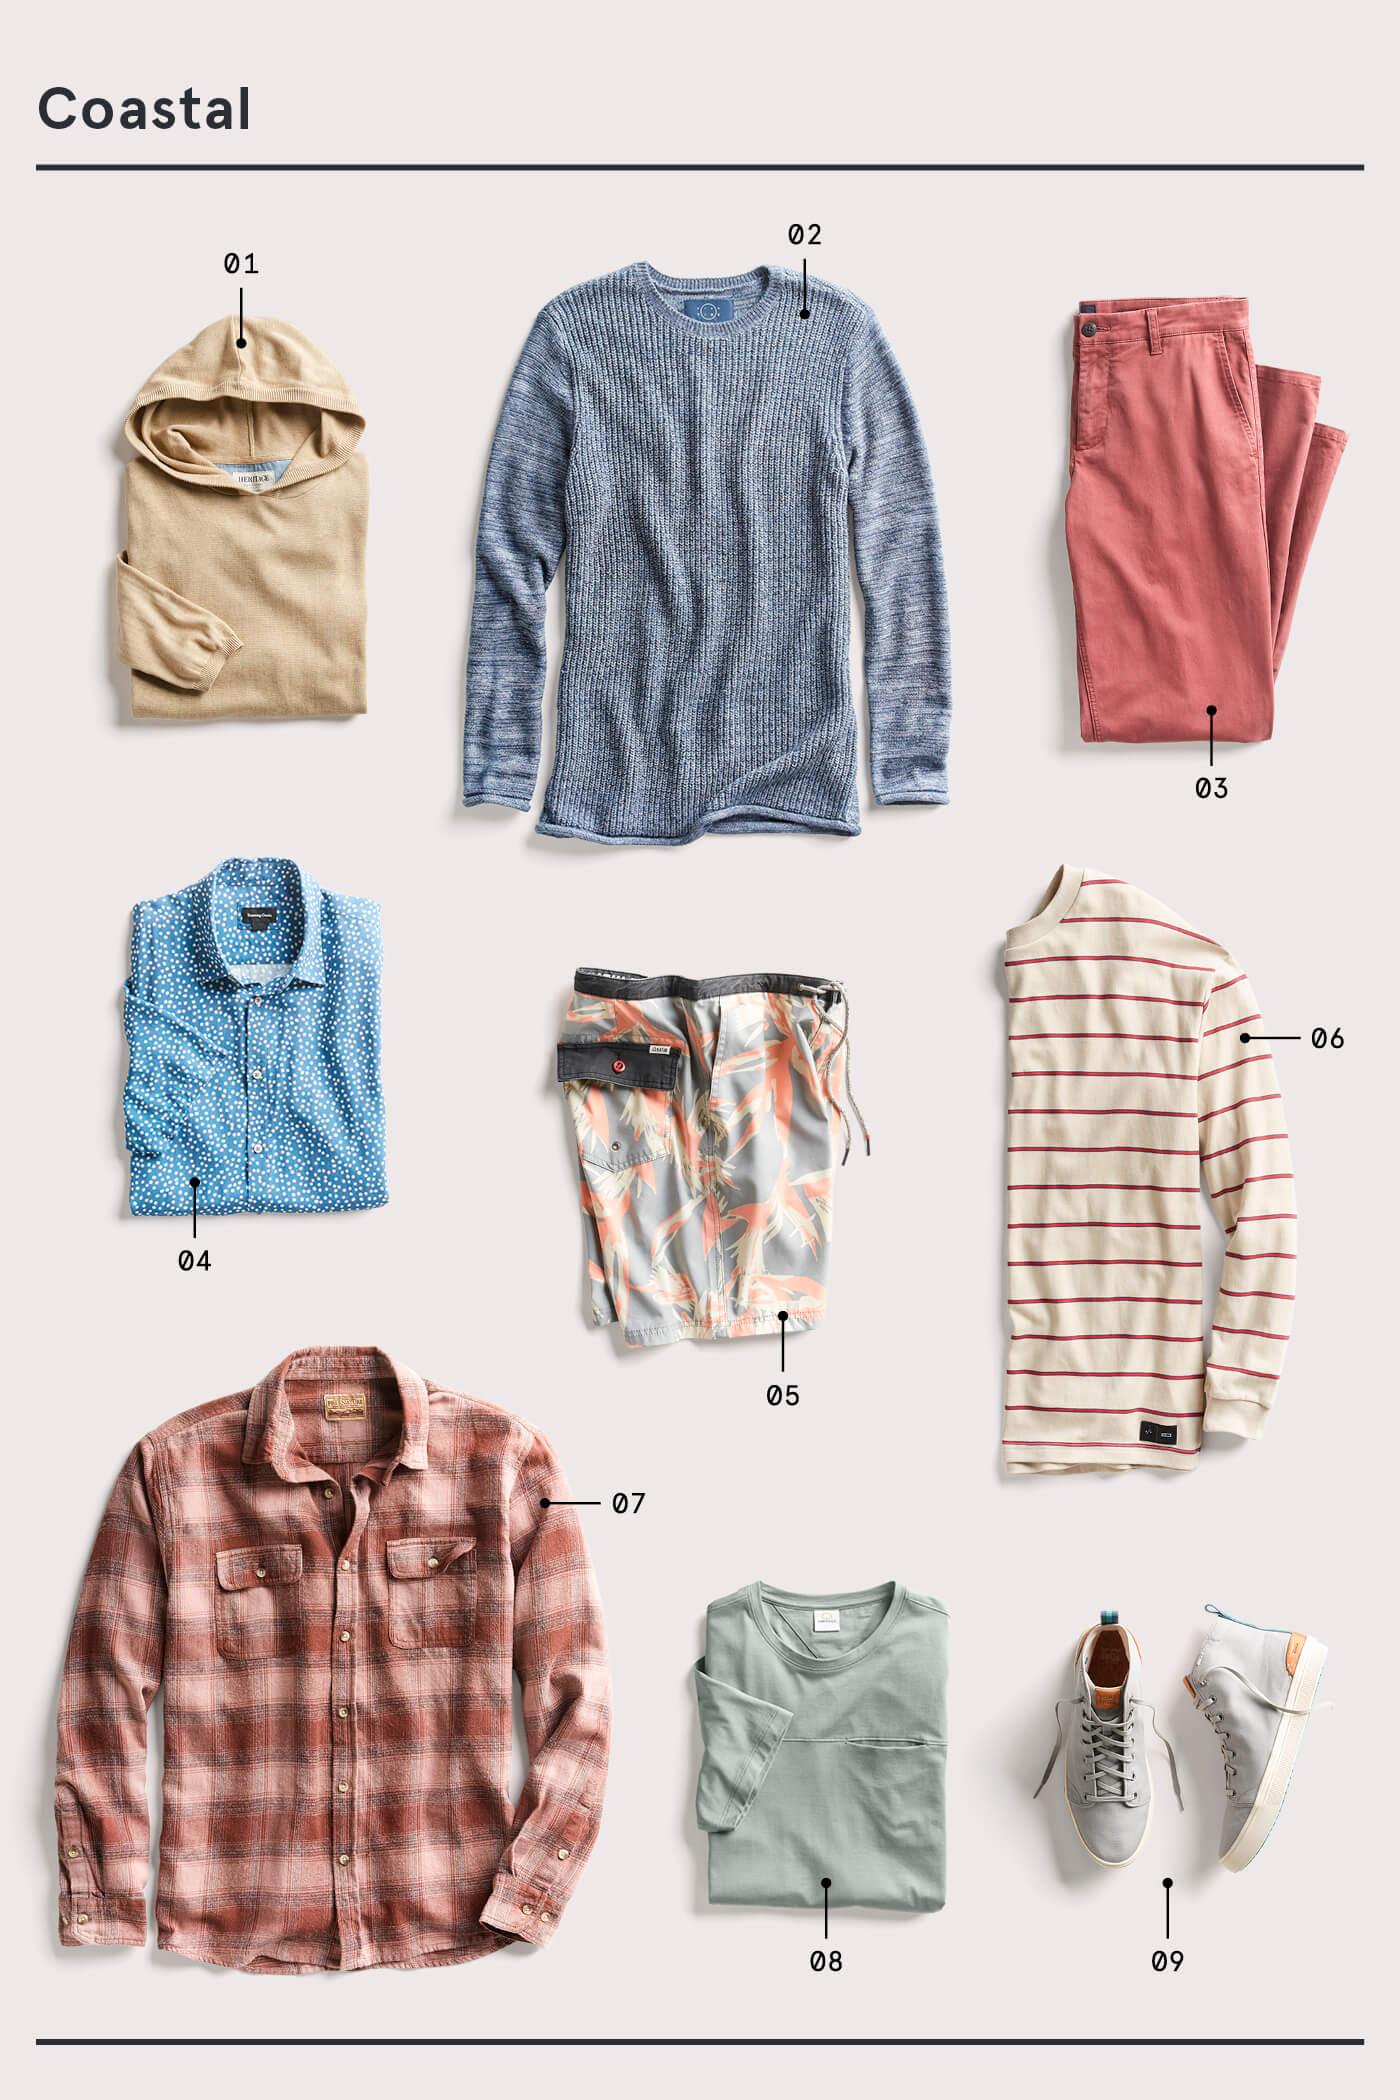 men's coastal style essentials